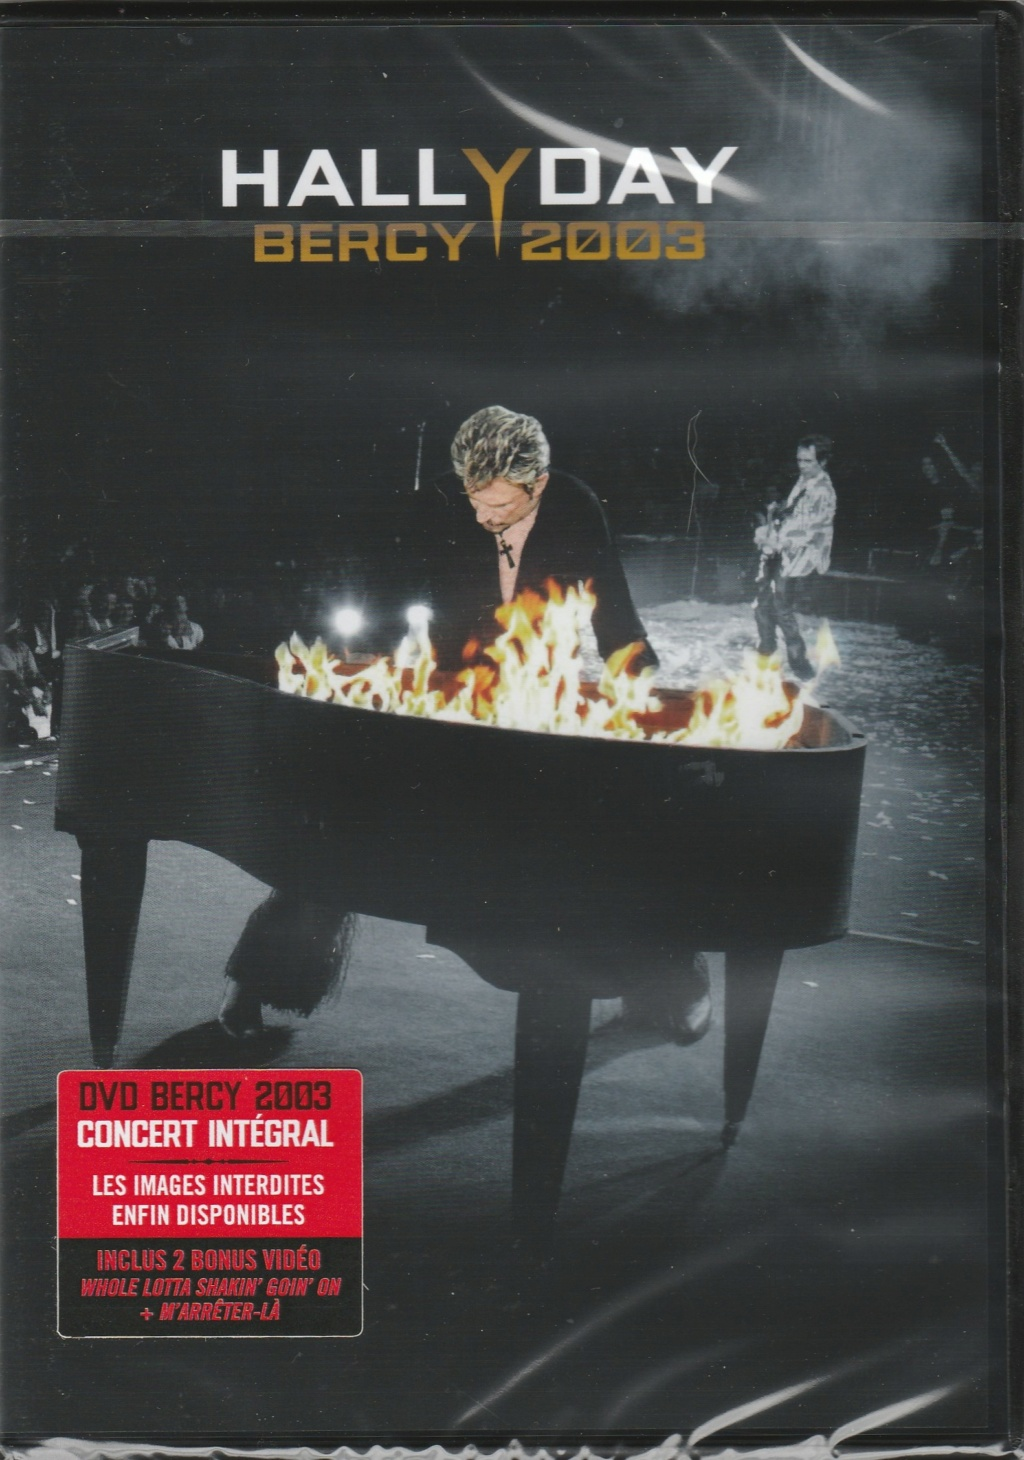 JAQUETTE DVD CONCERTS ( Jaquette + Sticker ) Img_2452